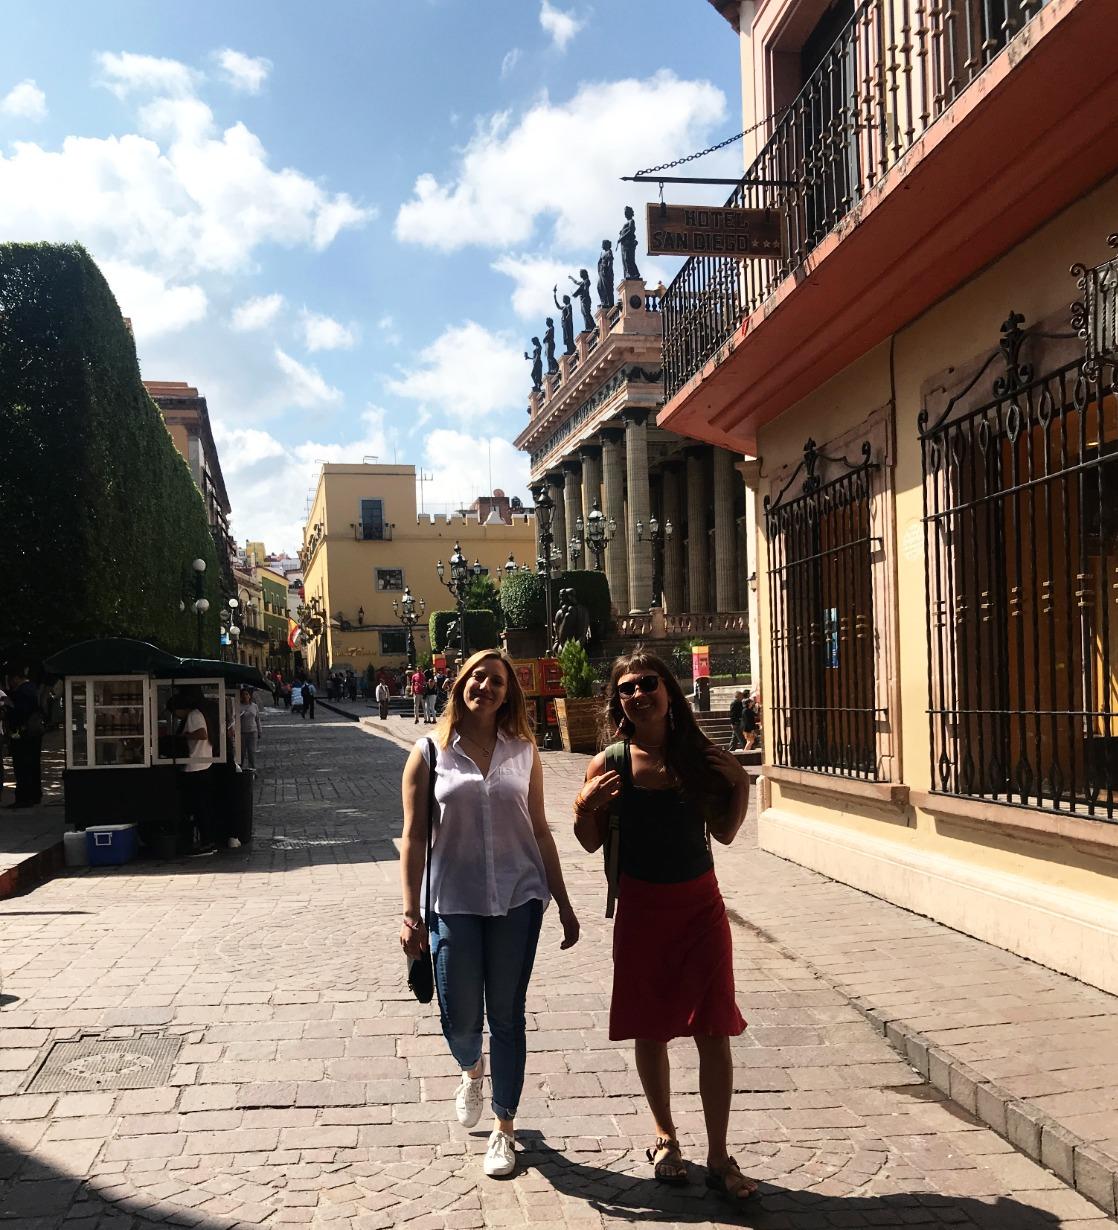 Walking in Guanajuato